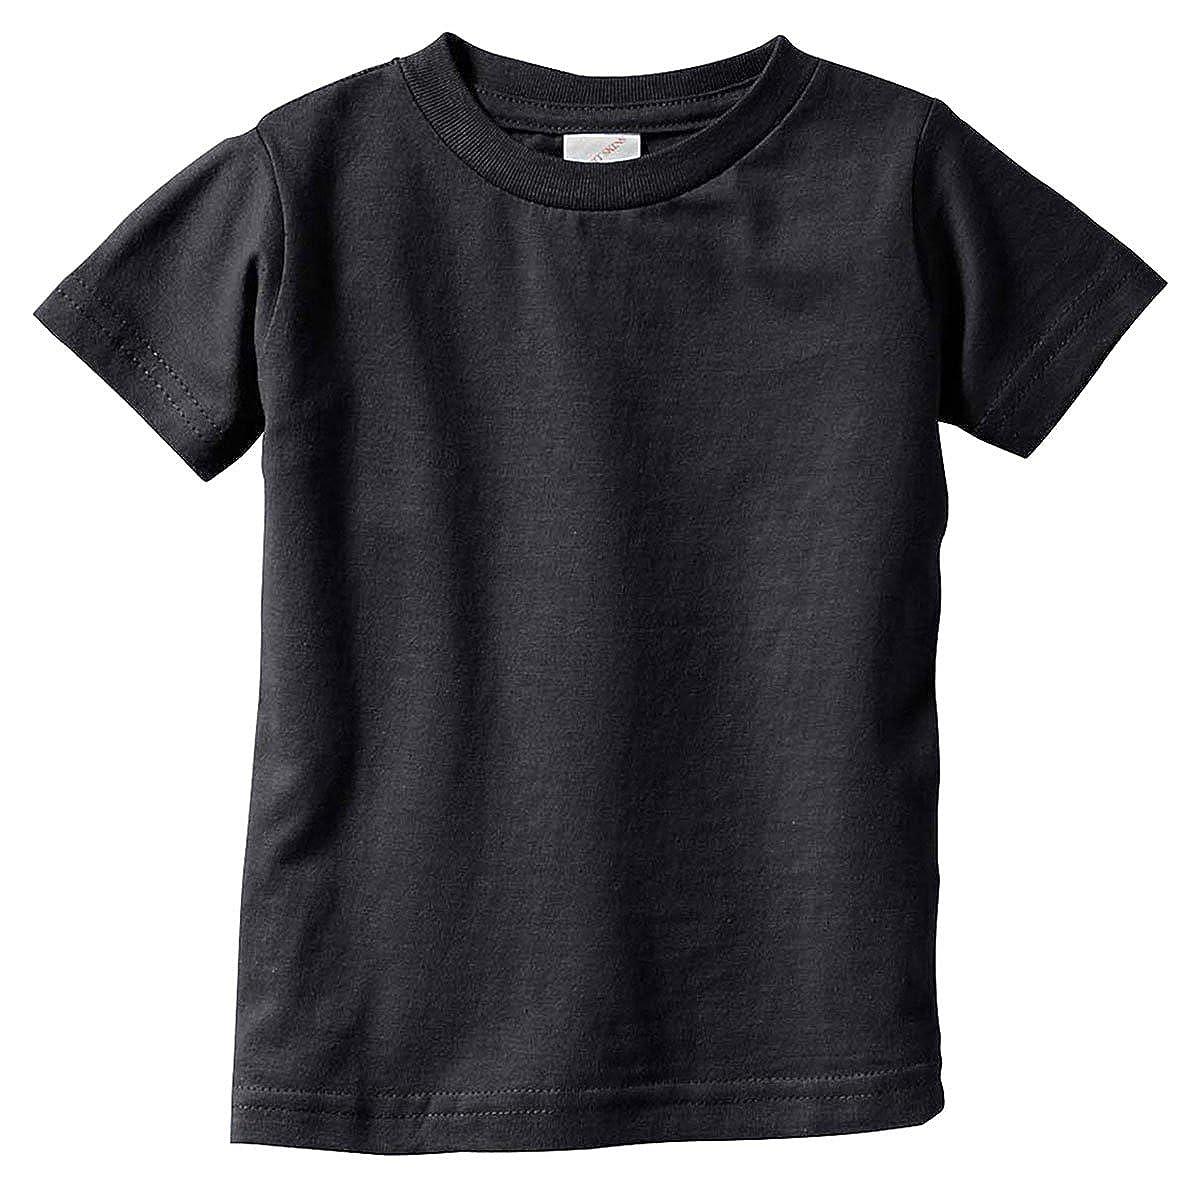 - BLACK 6MOS 3322 Fine Jersey T-Shirt Rabbit Skins Baby 4.5 Oz